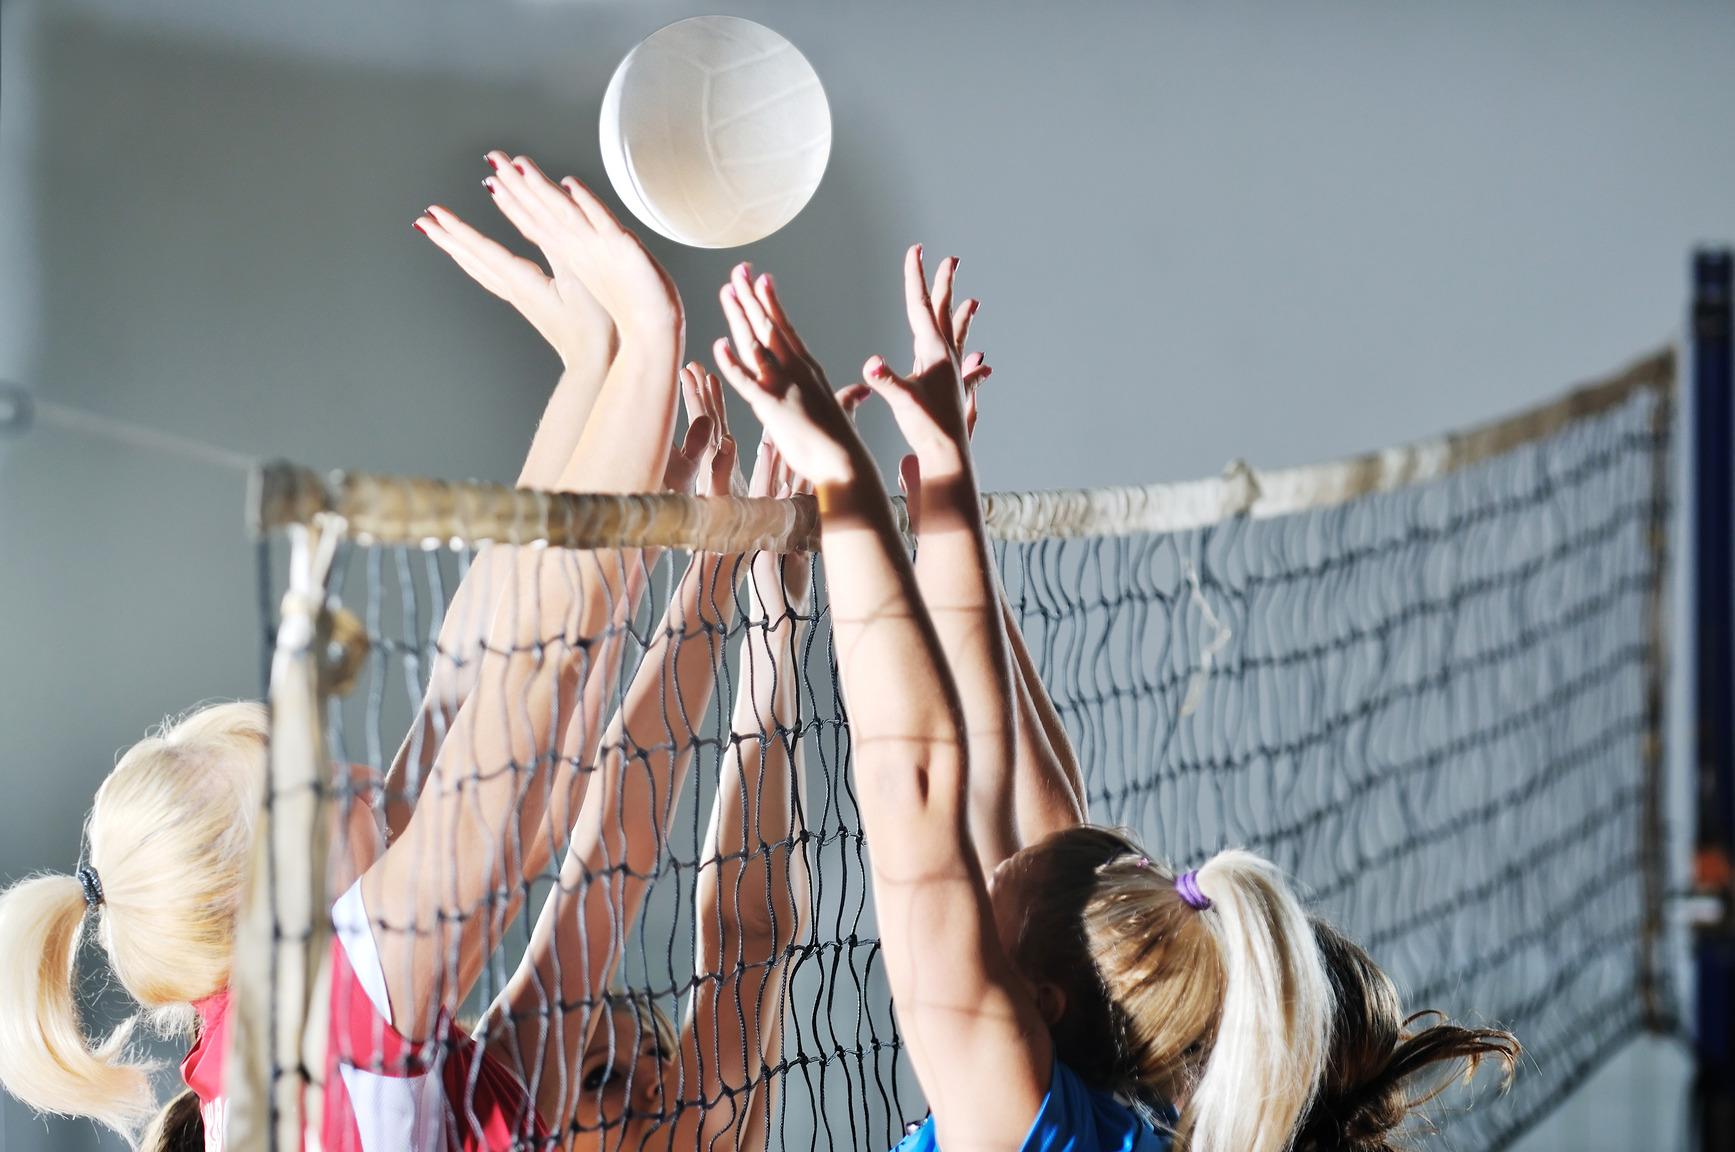 photodune-1814050-volleyball-m